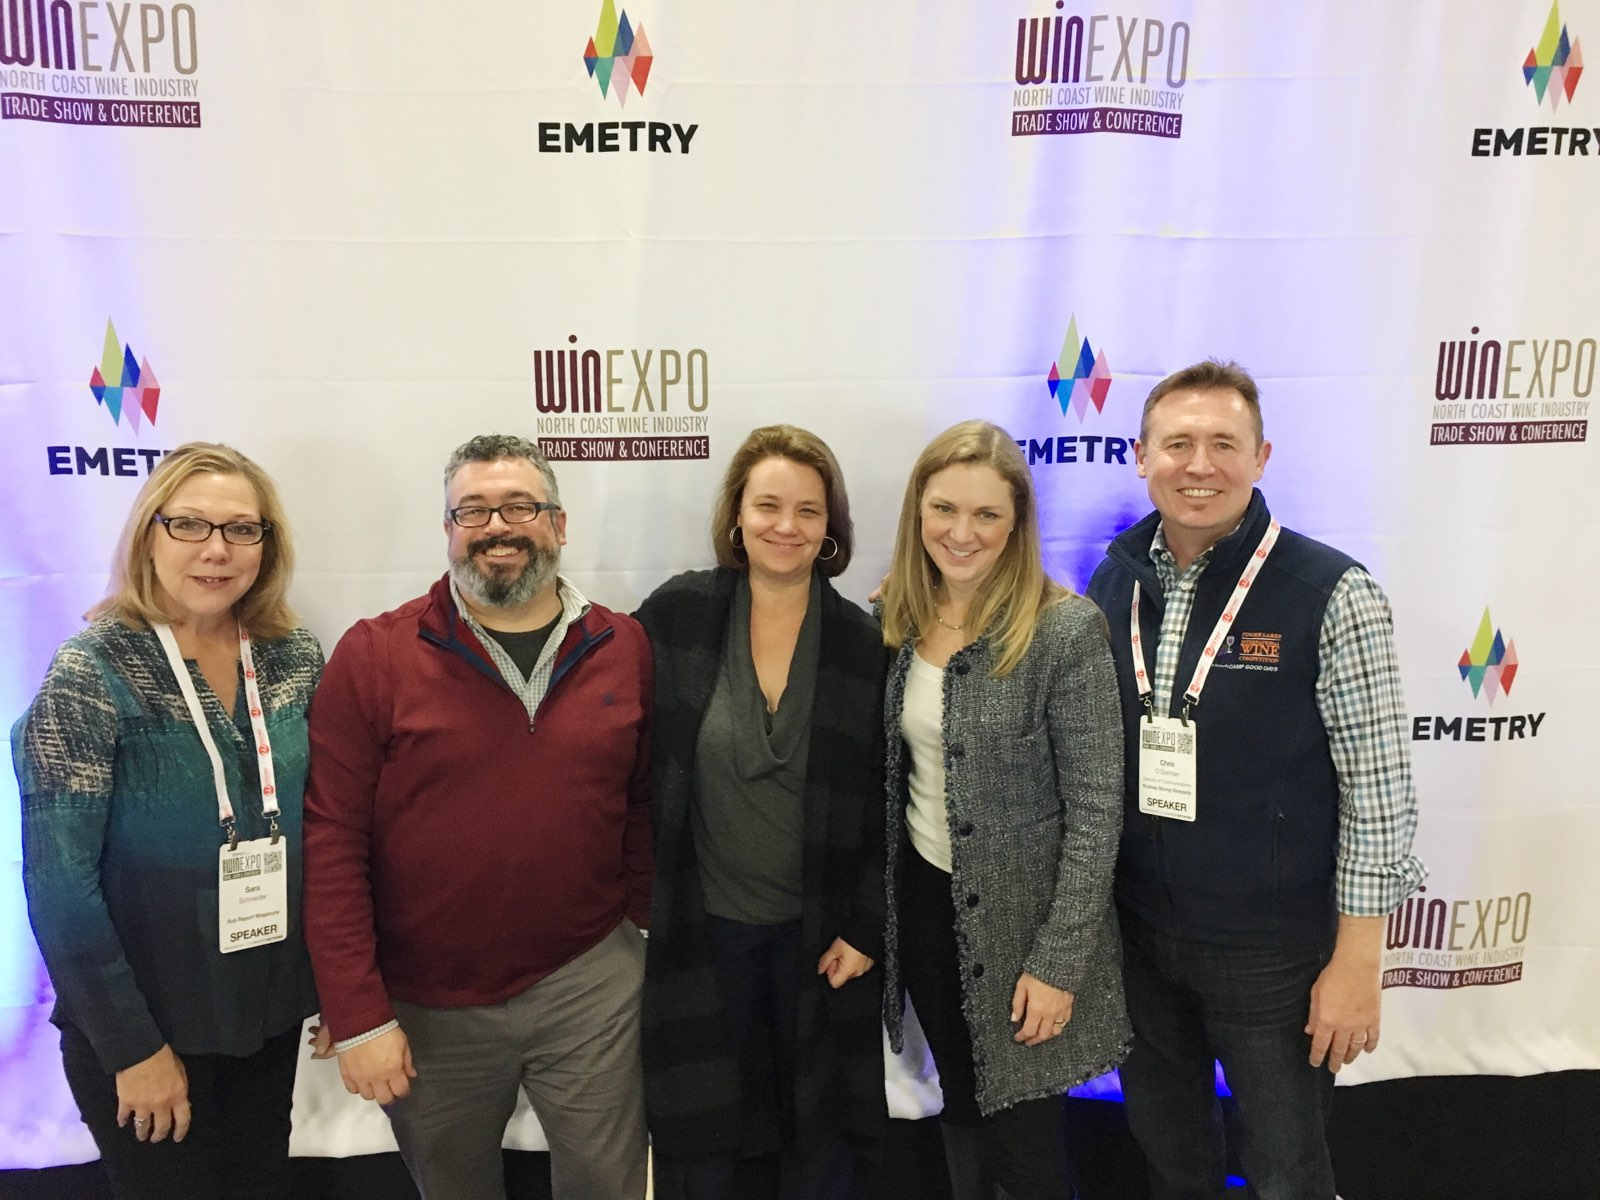 Panel (from left to right): Sara Schneider, Michael Wangbickler, Virginie Boone, Katie Calhoun, and Chris O'Gorman